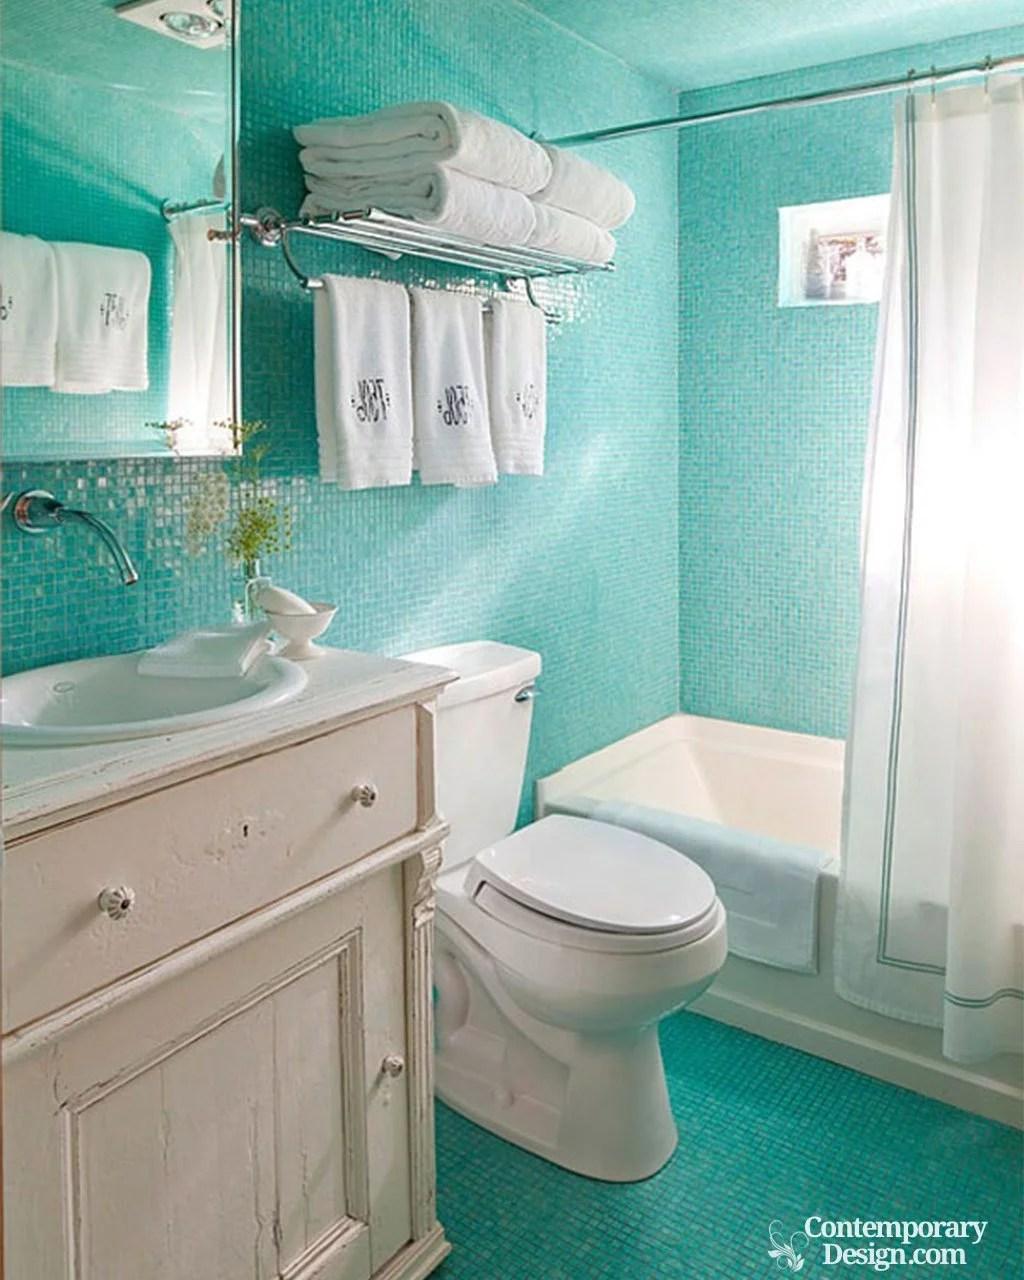 Simple bathroom designs for small spaces - Contemporary-design